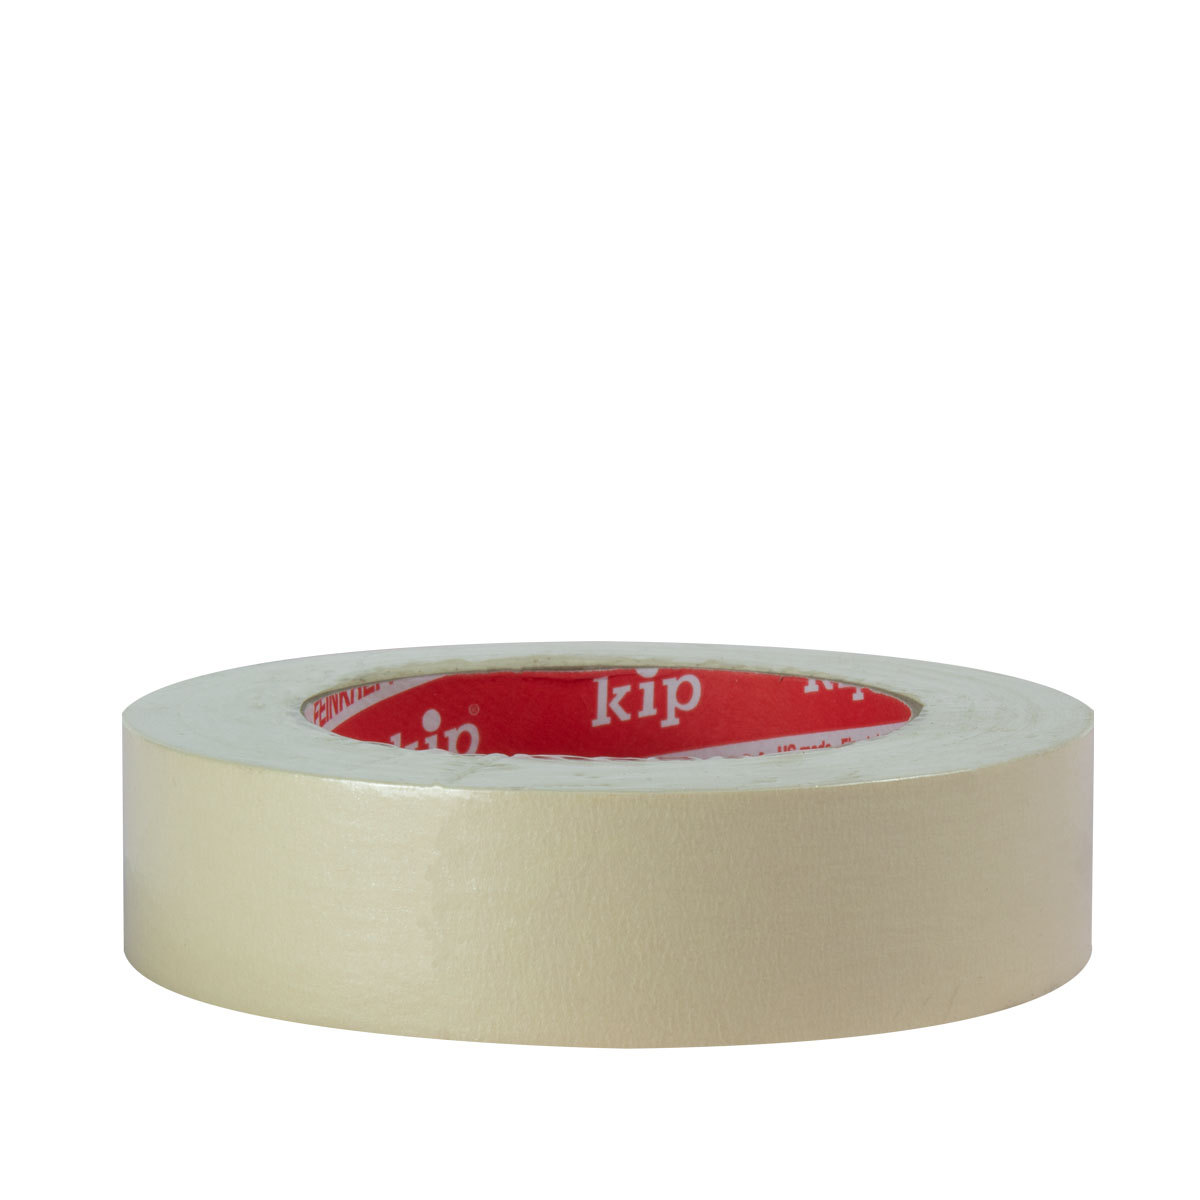 Kip 301 Feinkrepp Extra 30mm, Malerkrepp, Profi-Maler-Qualität